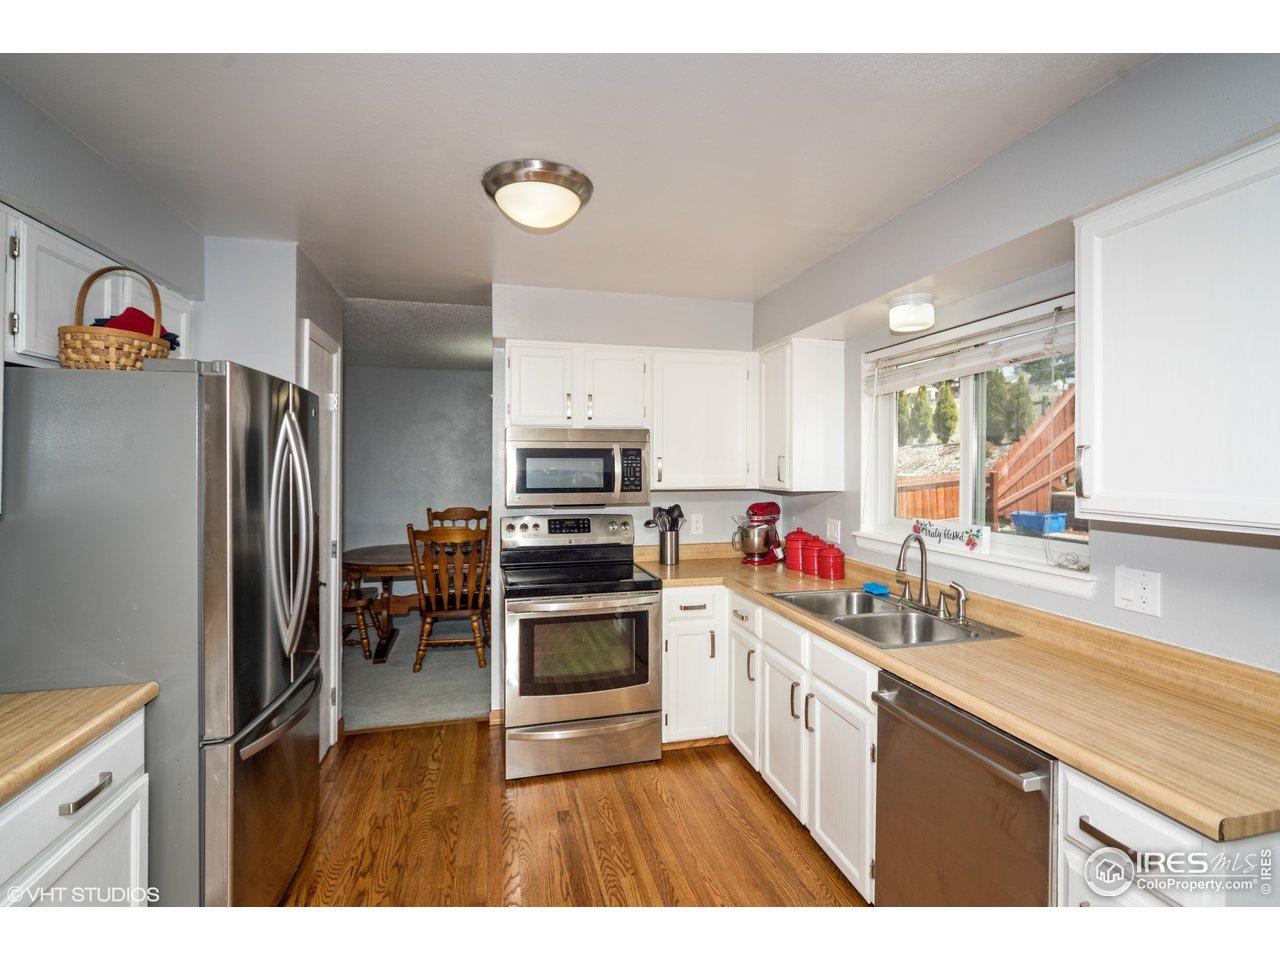 Stainless steel appliances,wood floors